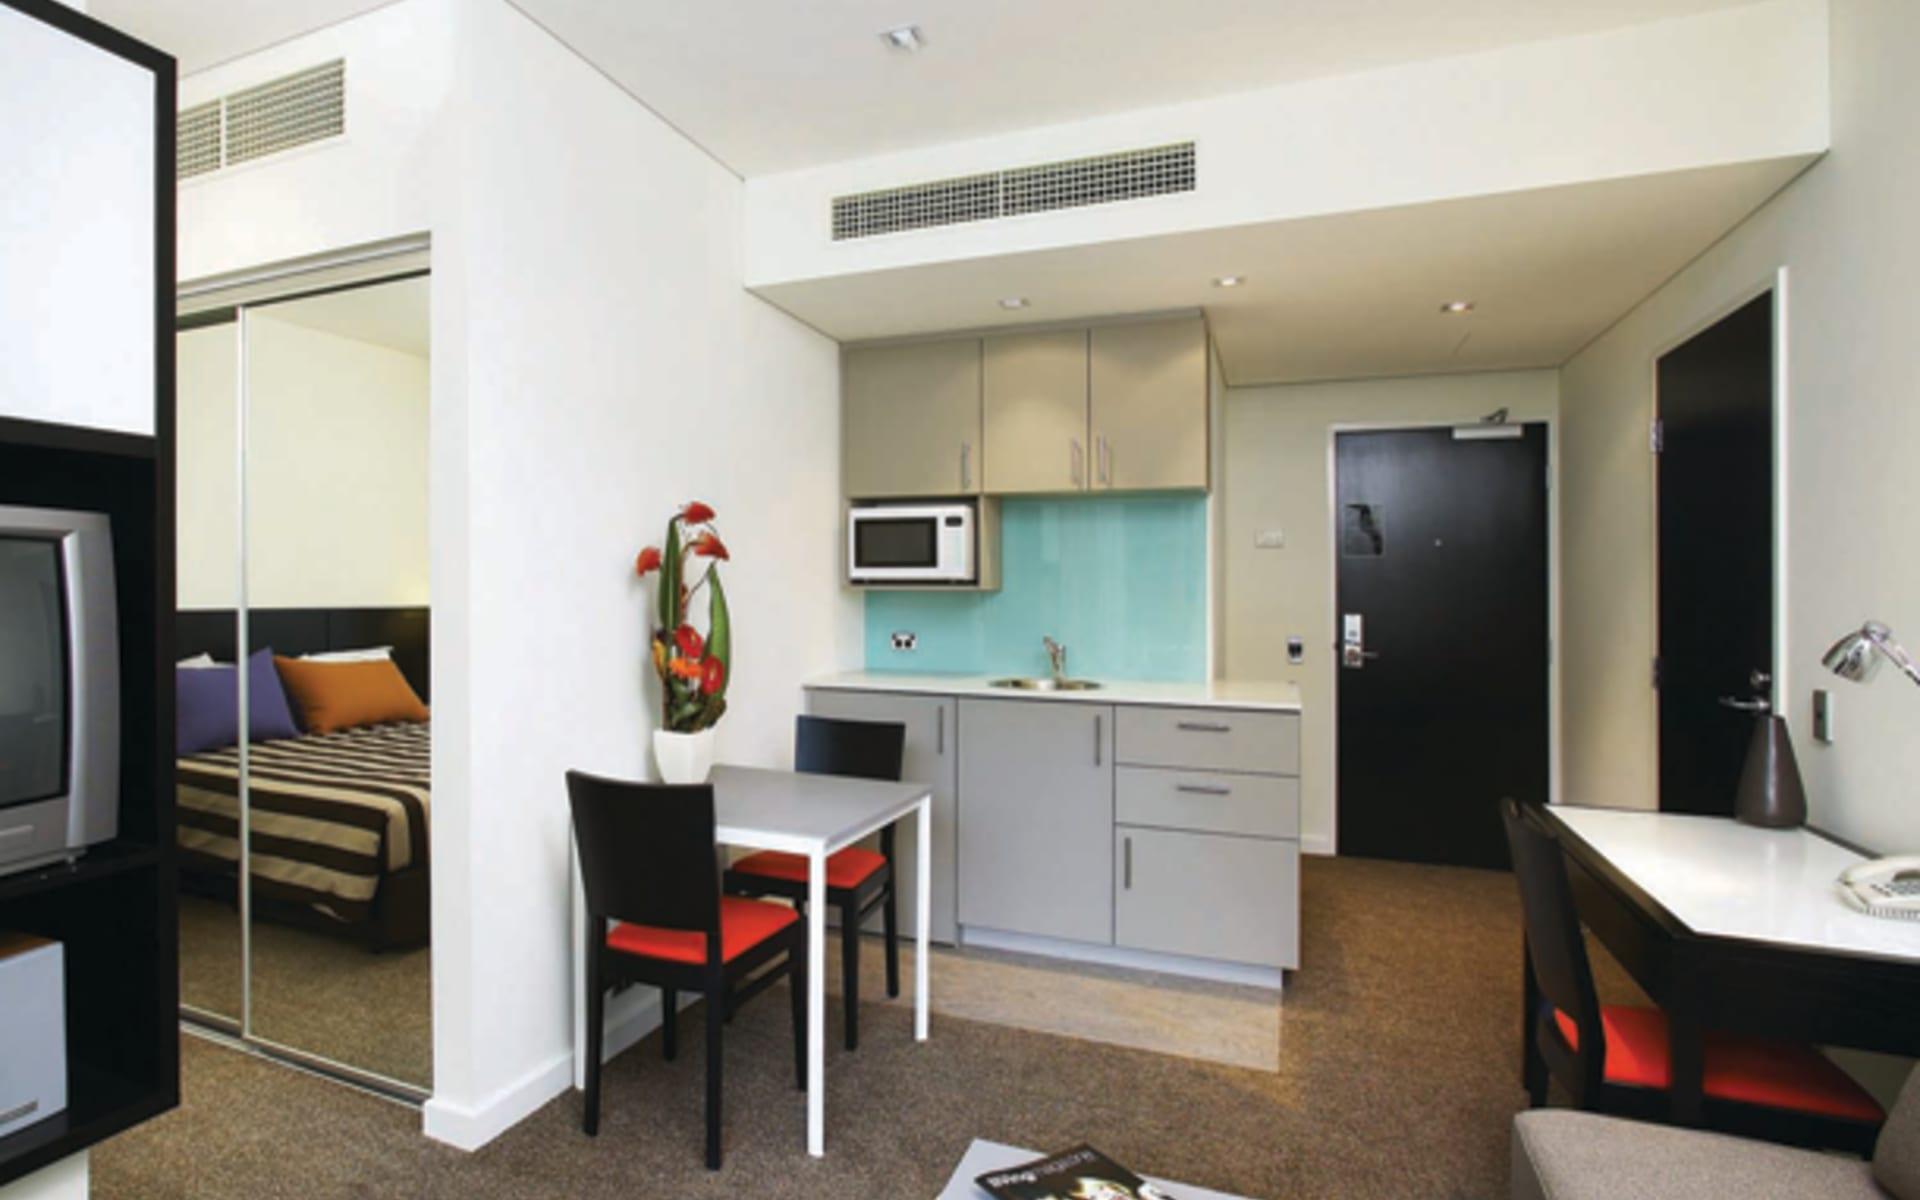 Adina Apartment Hotel Perth:  Adina Apartment Hotel Perth - 1-Bedroom Premier Apartment